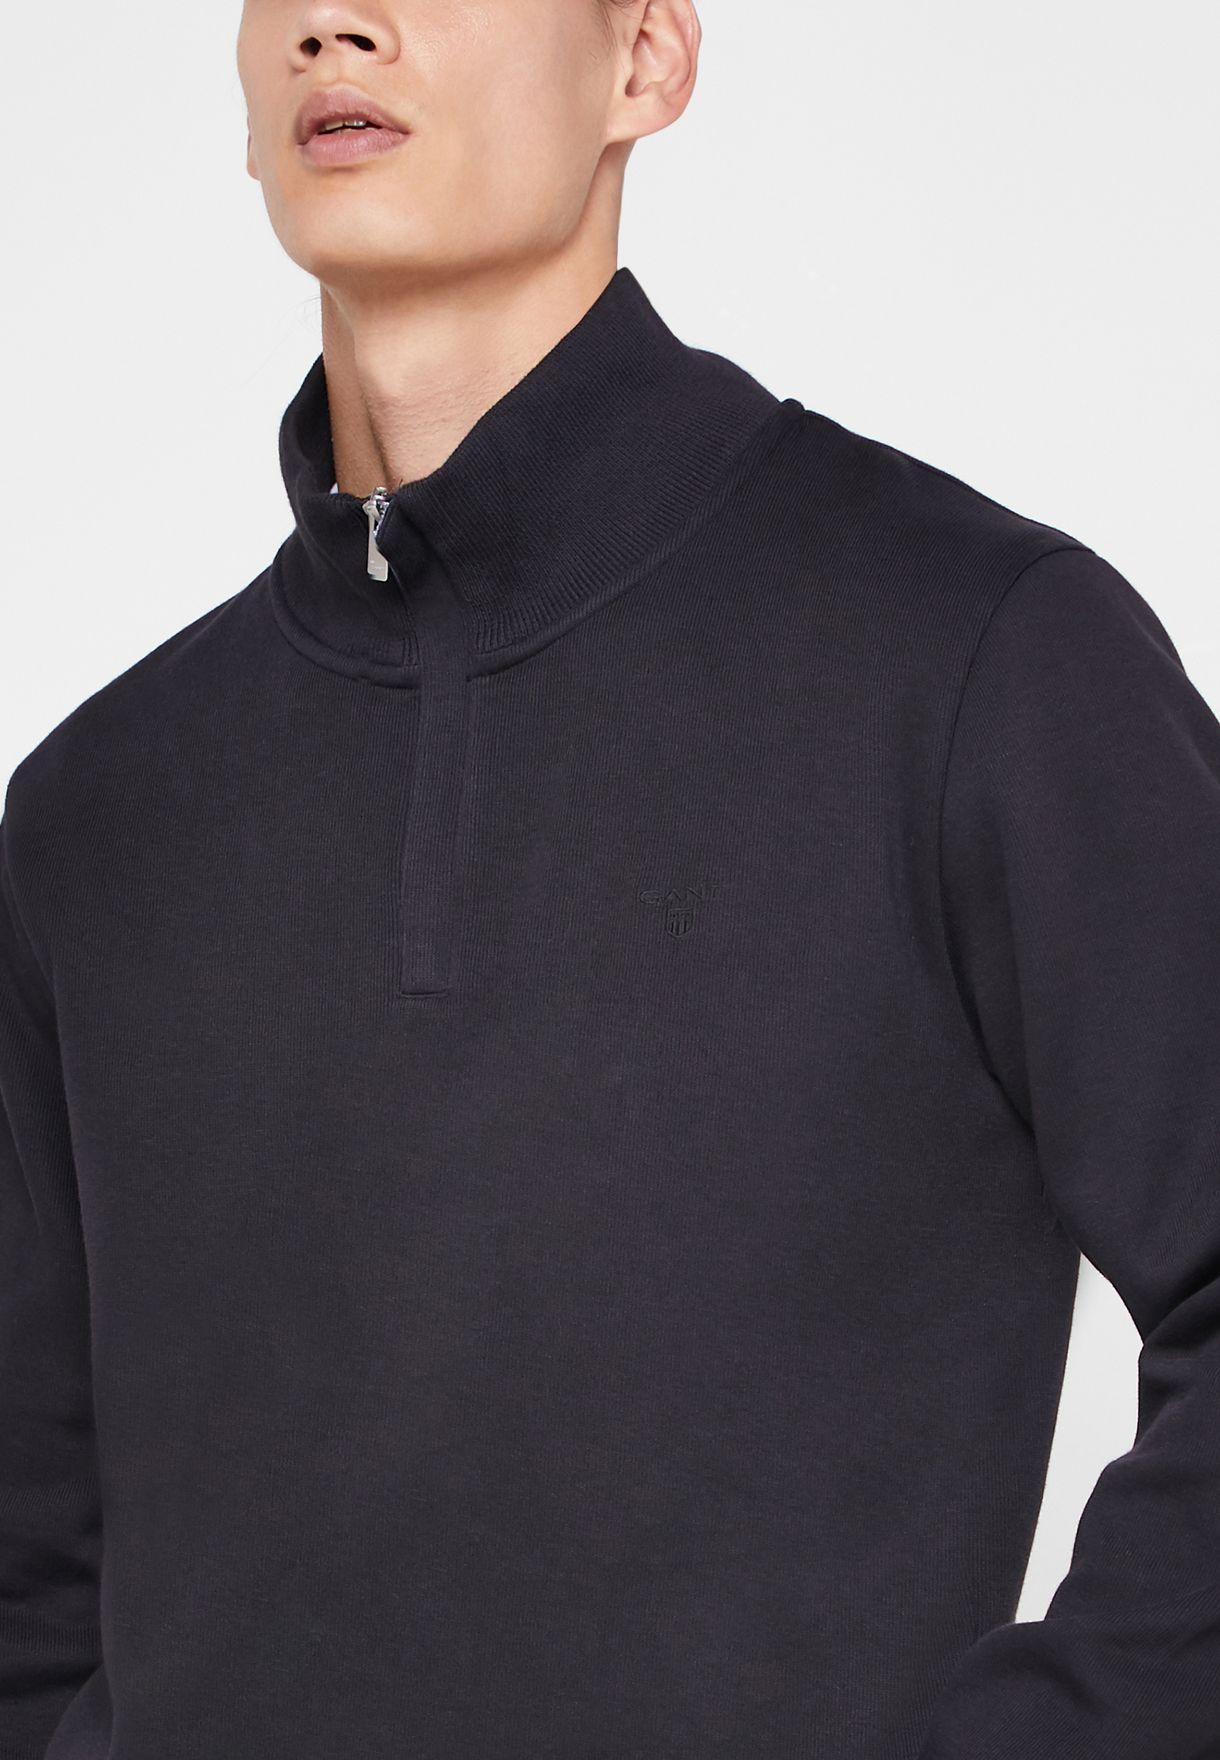 Sacker Ribbed Half Zip Sweatshirt